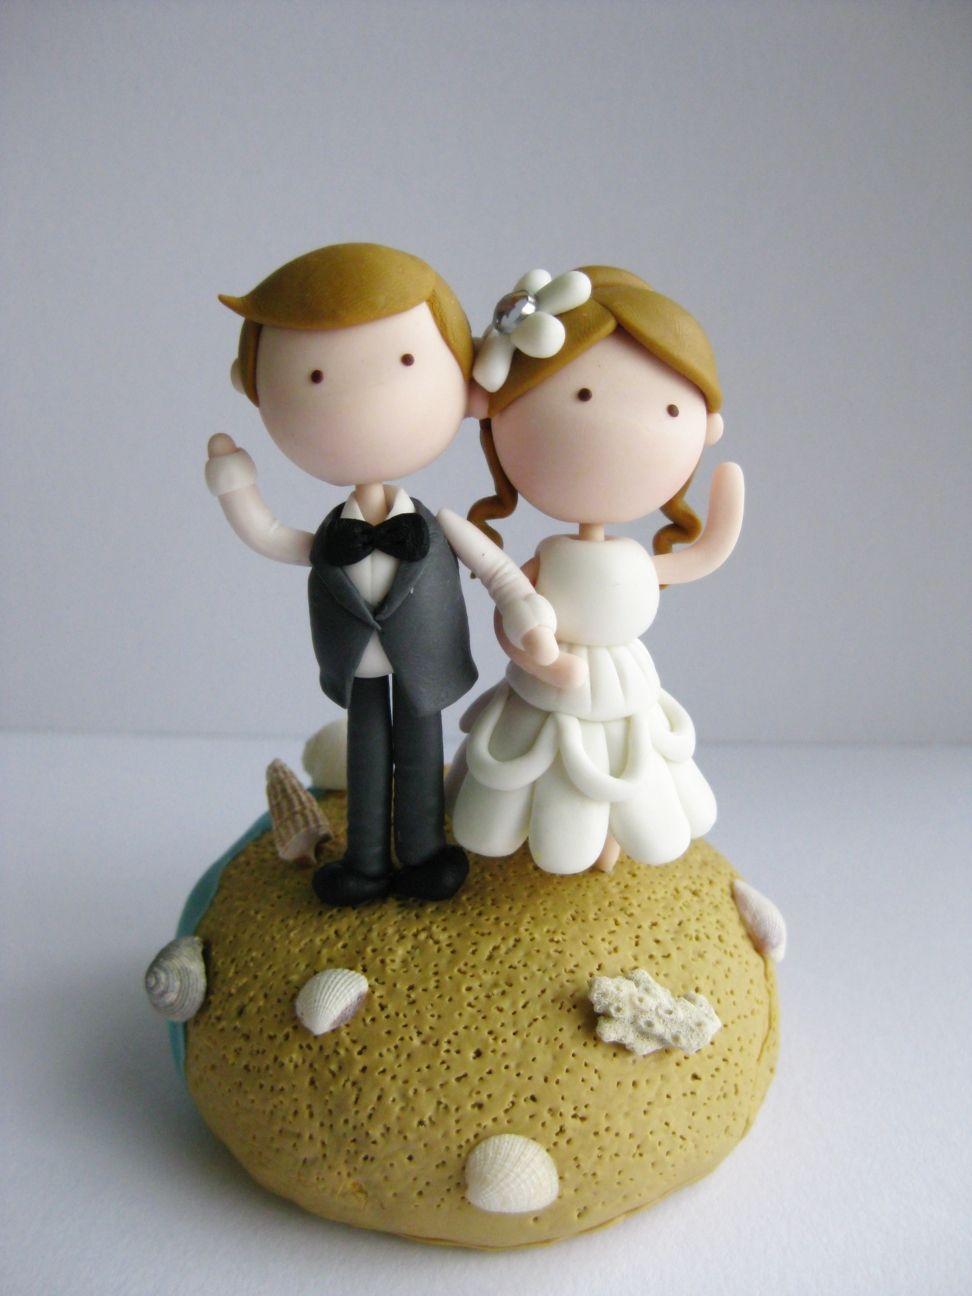 bride clay figuerine | Cute wedding couple figurine, beach theme ...